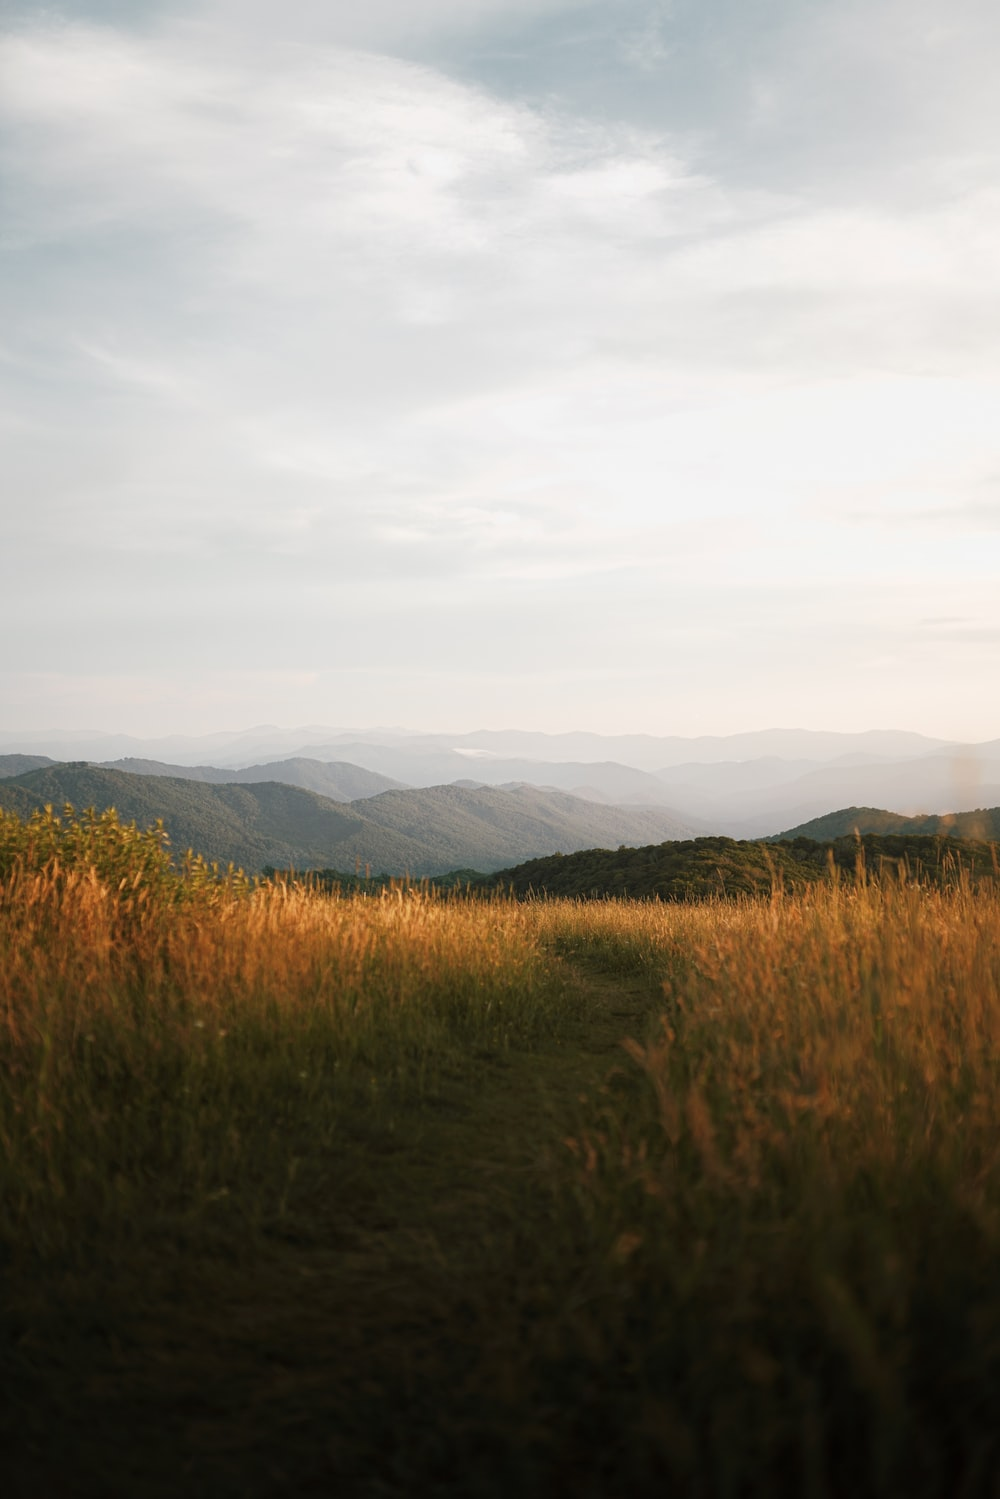 brown grass field near mountains during daytime